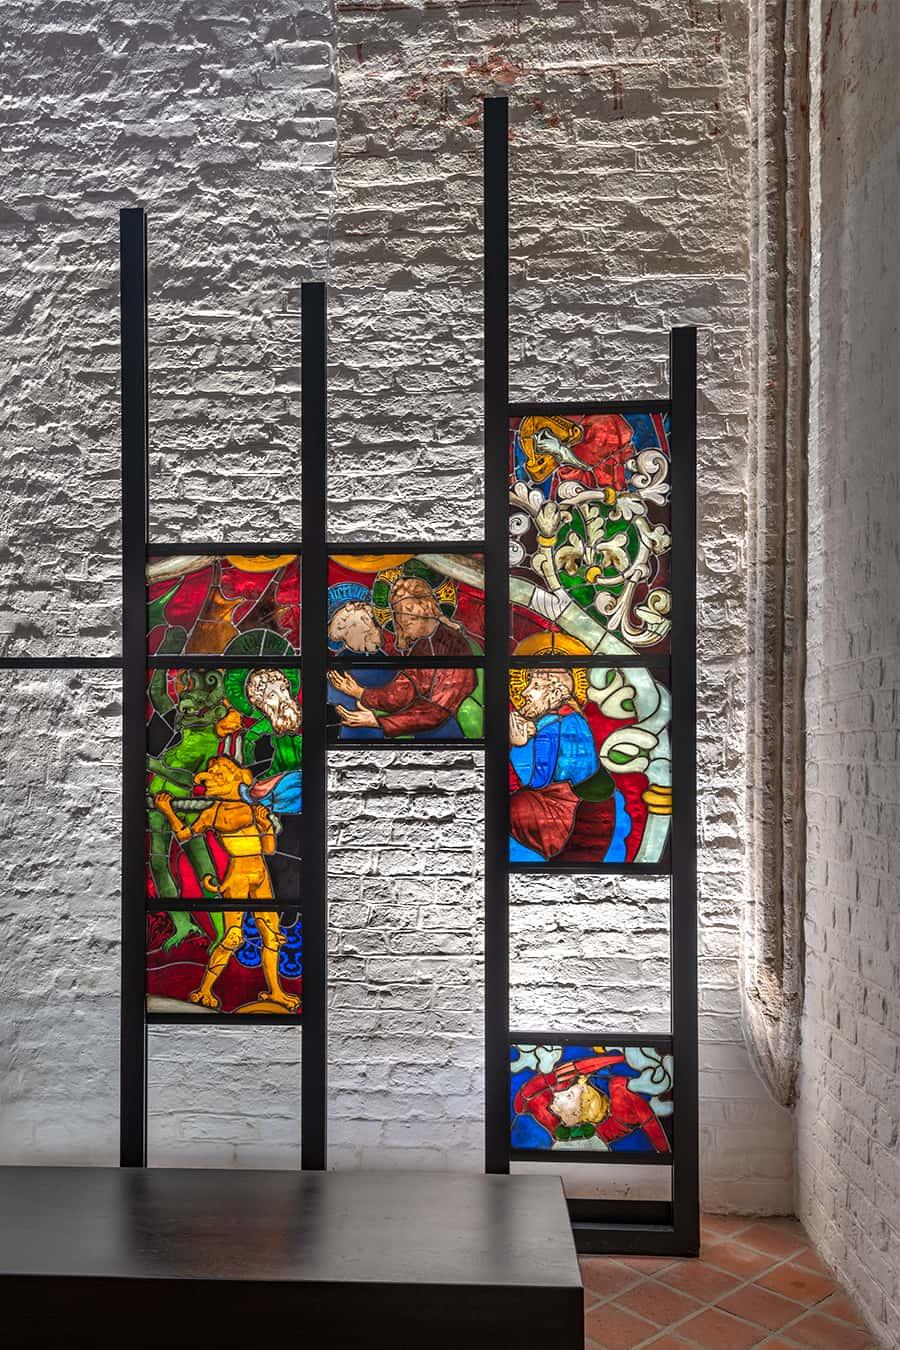 Kunstvolle bunte Glasmalereien